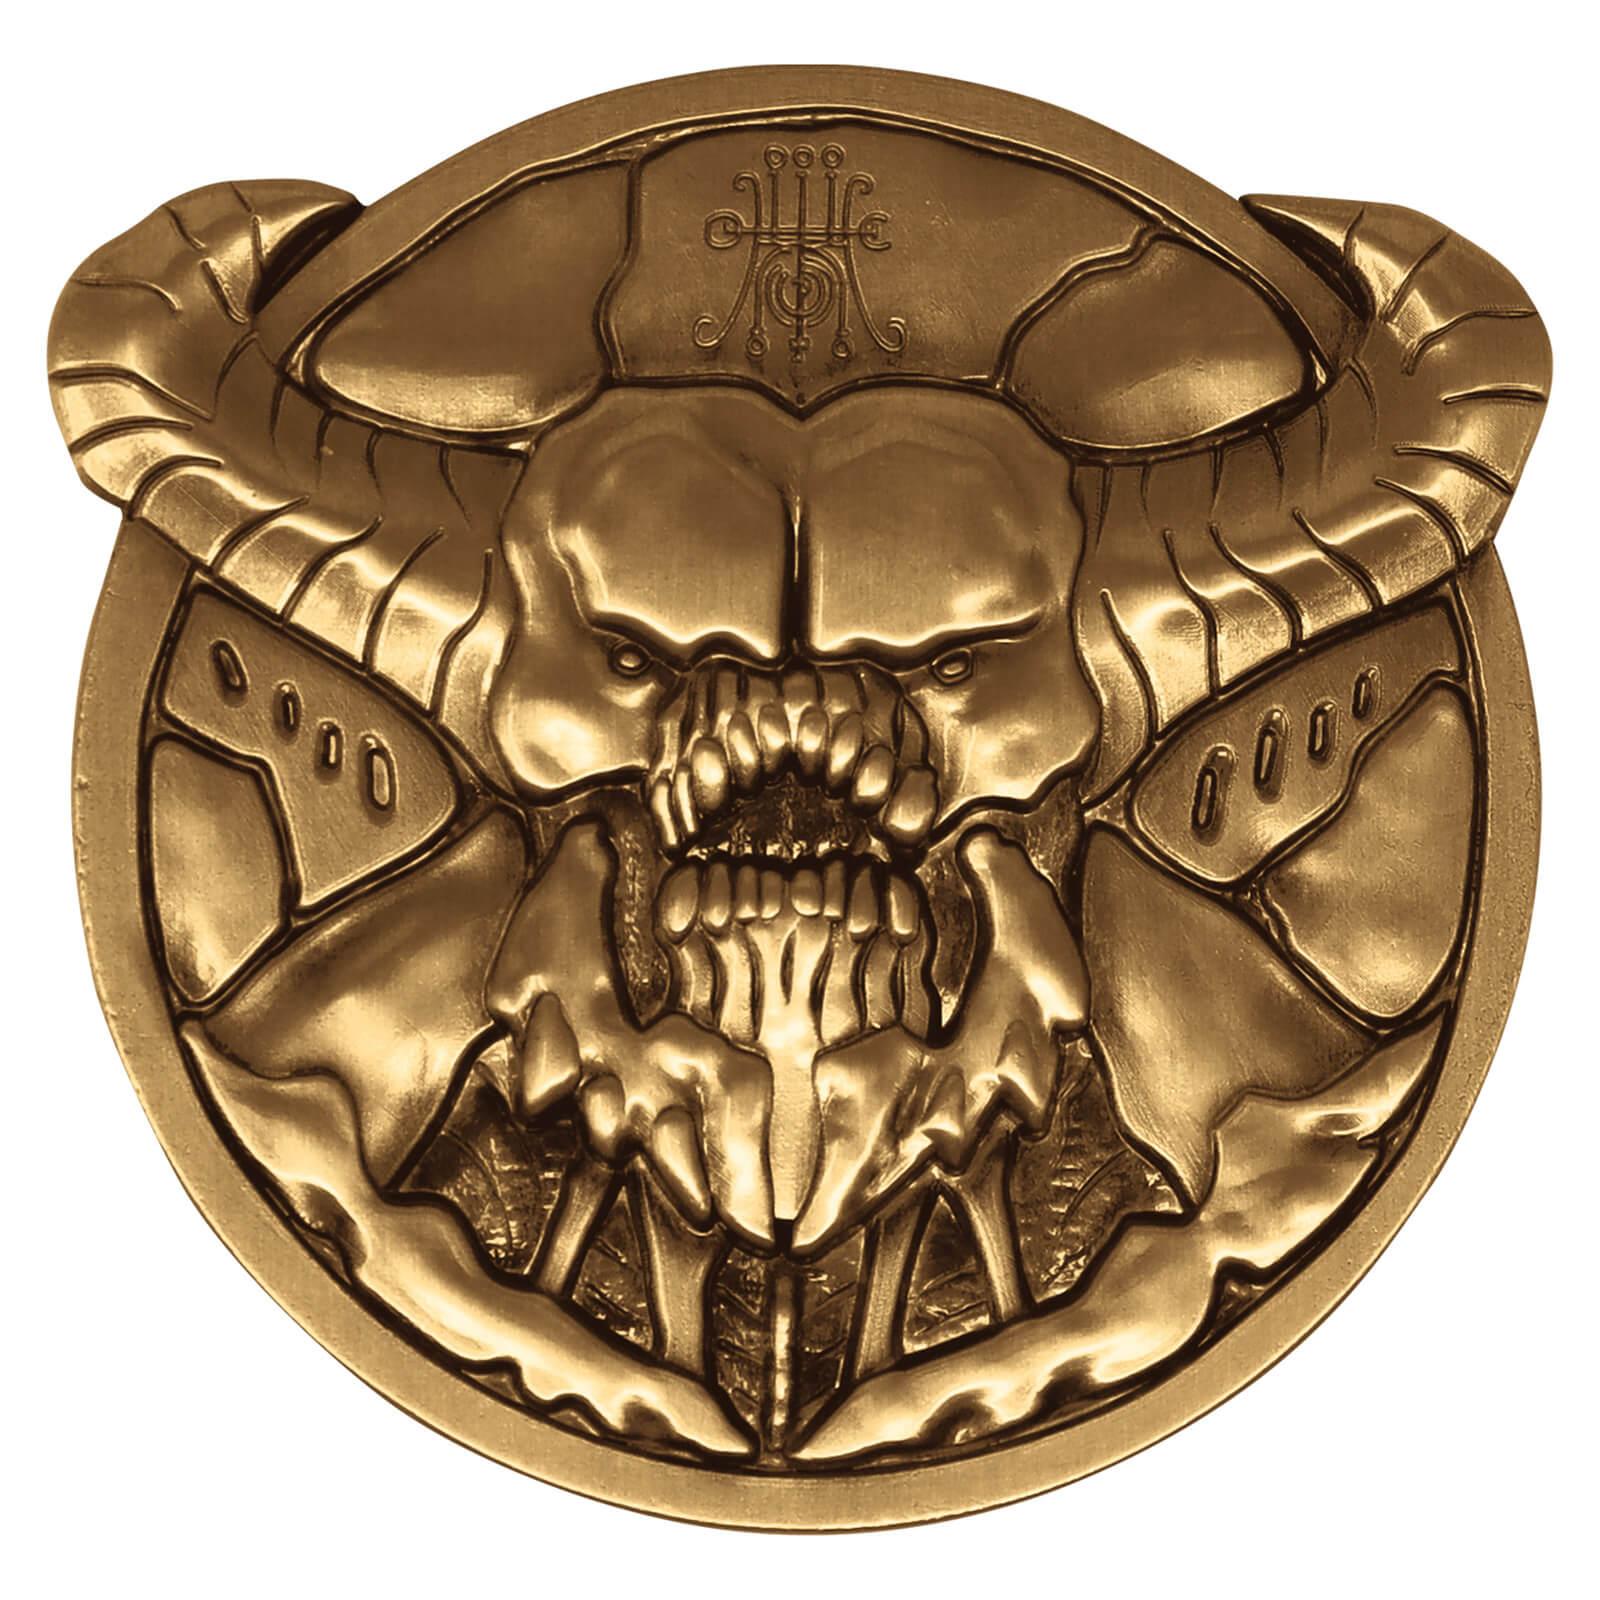 Fanattik Doom Baron Level Up Collectors Medallion